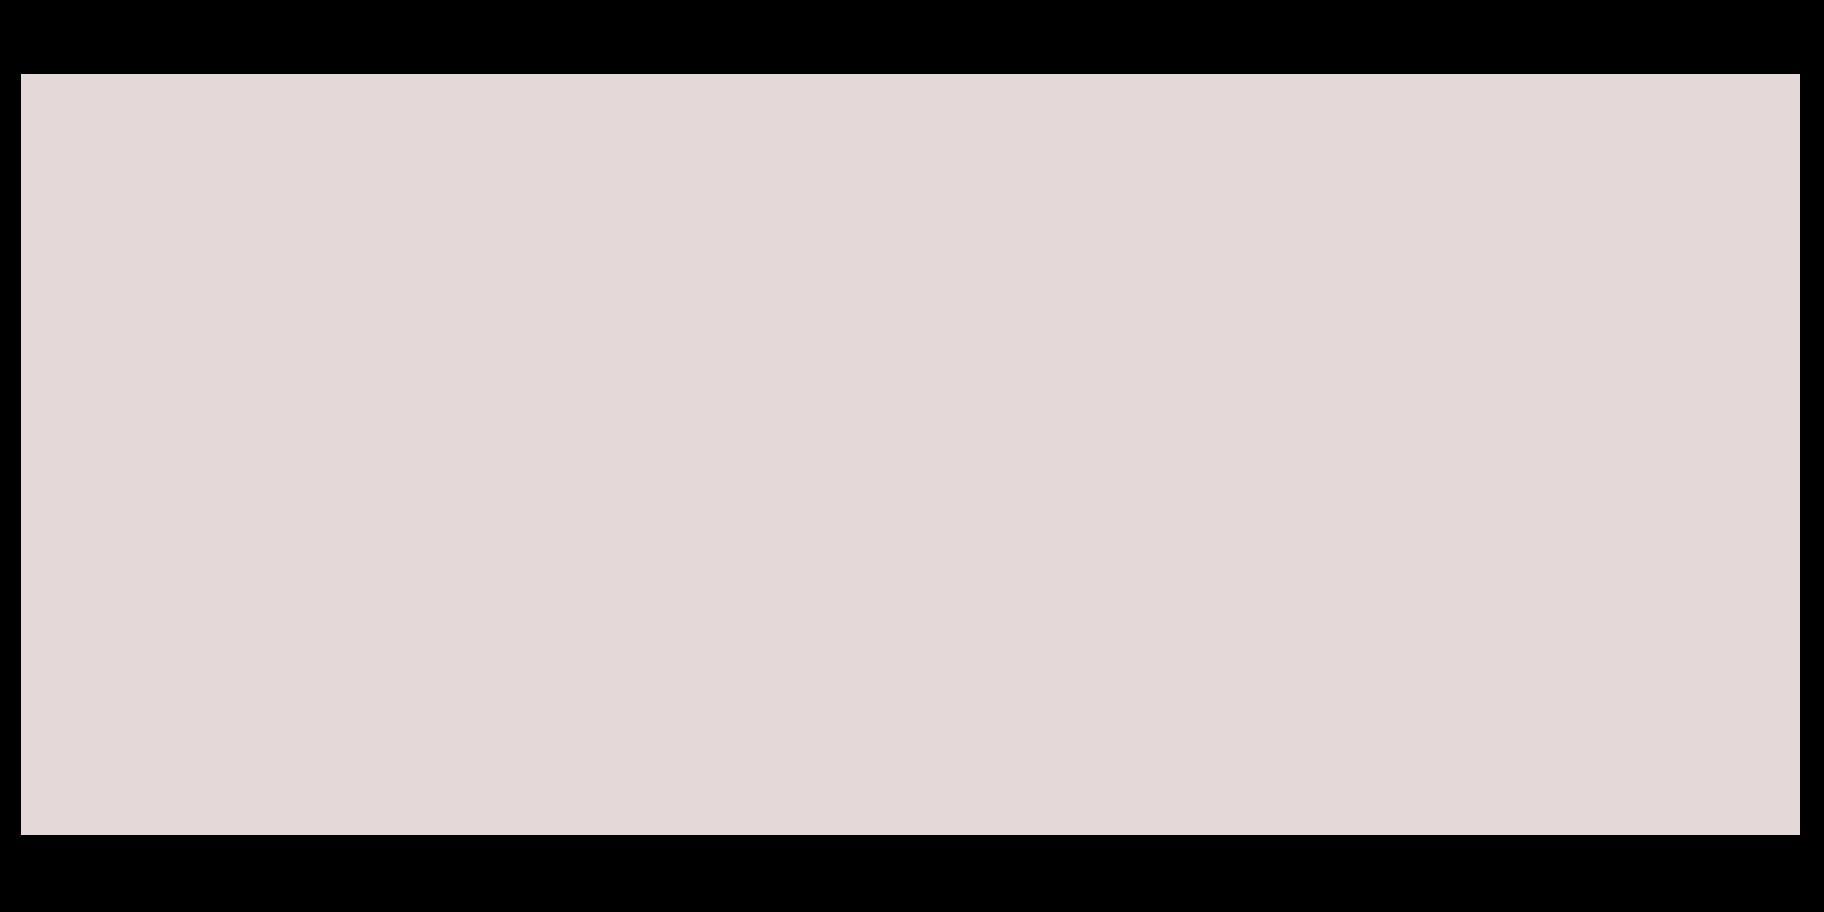 restangle nude Clipart illustration in PNG, SVG